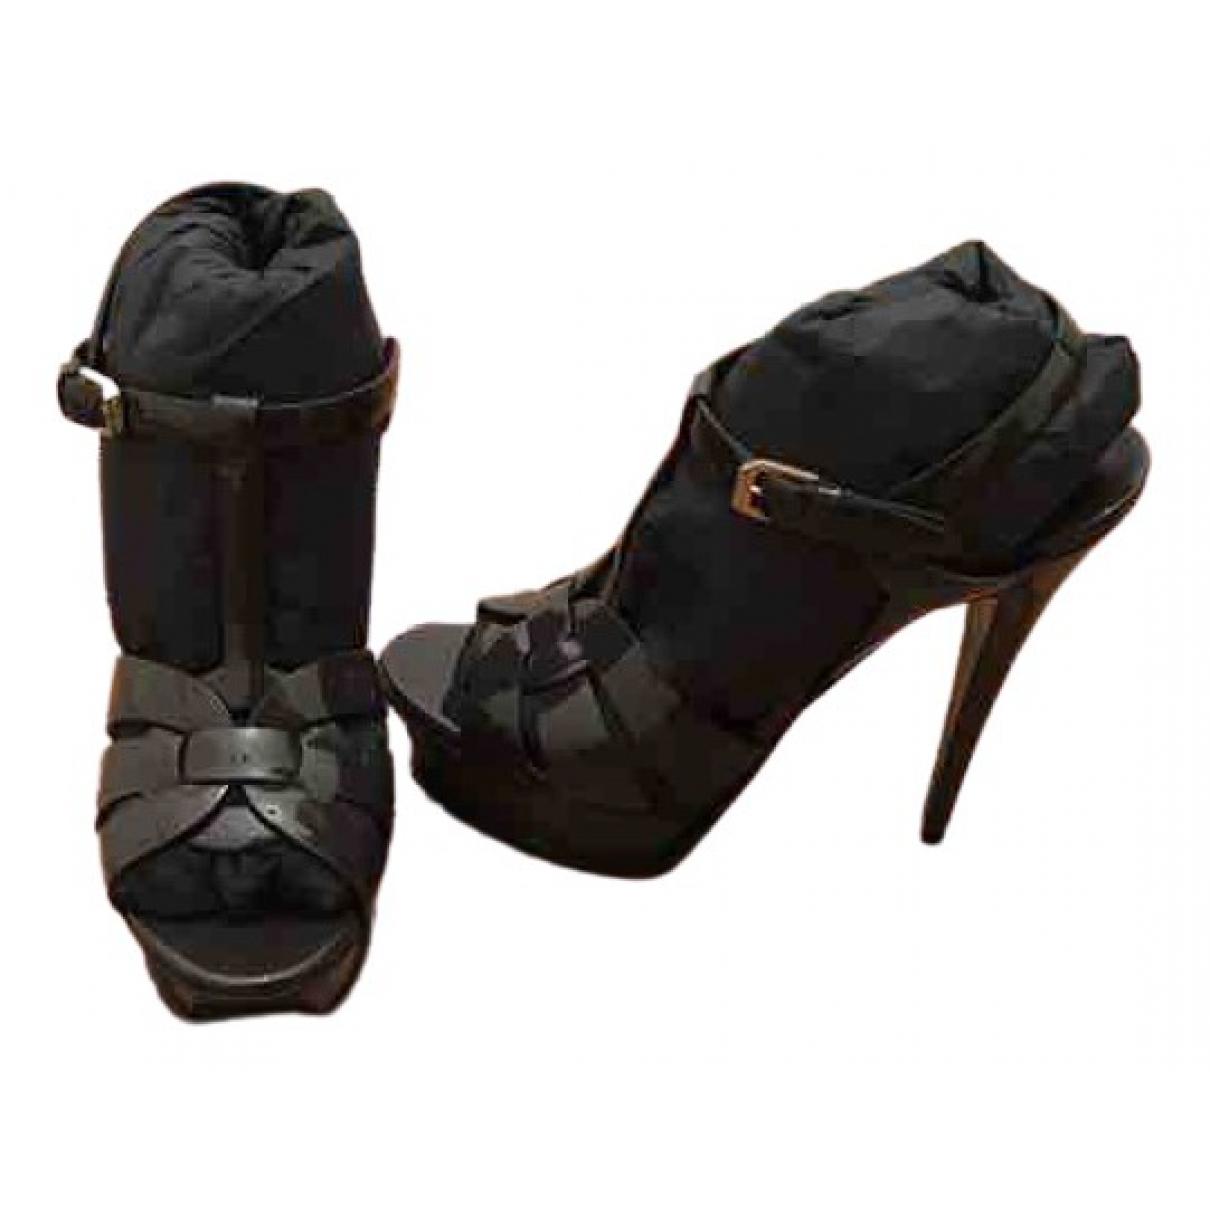 Saint Laurent \N Anthracite Patent leather Sandals for Women 38 EU